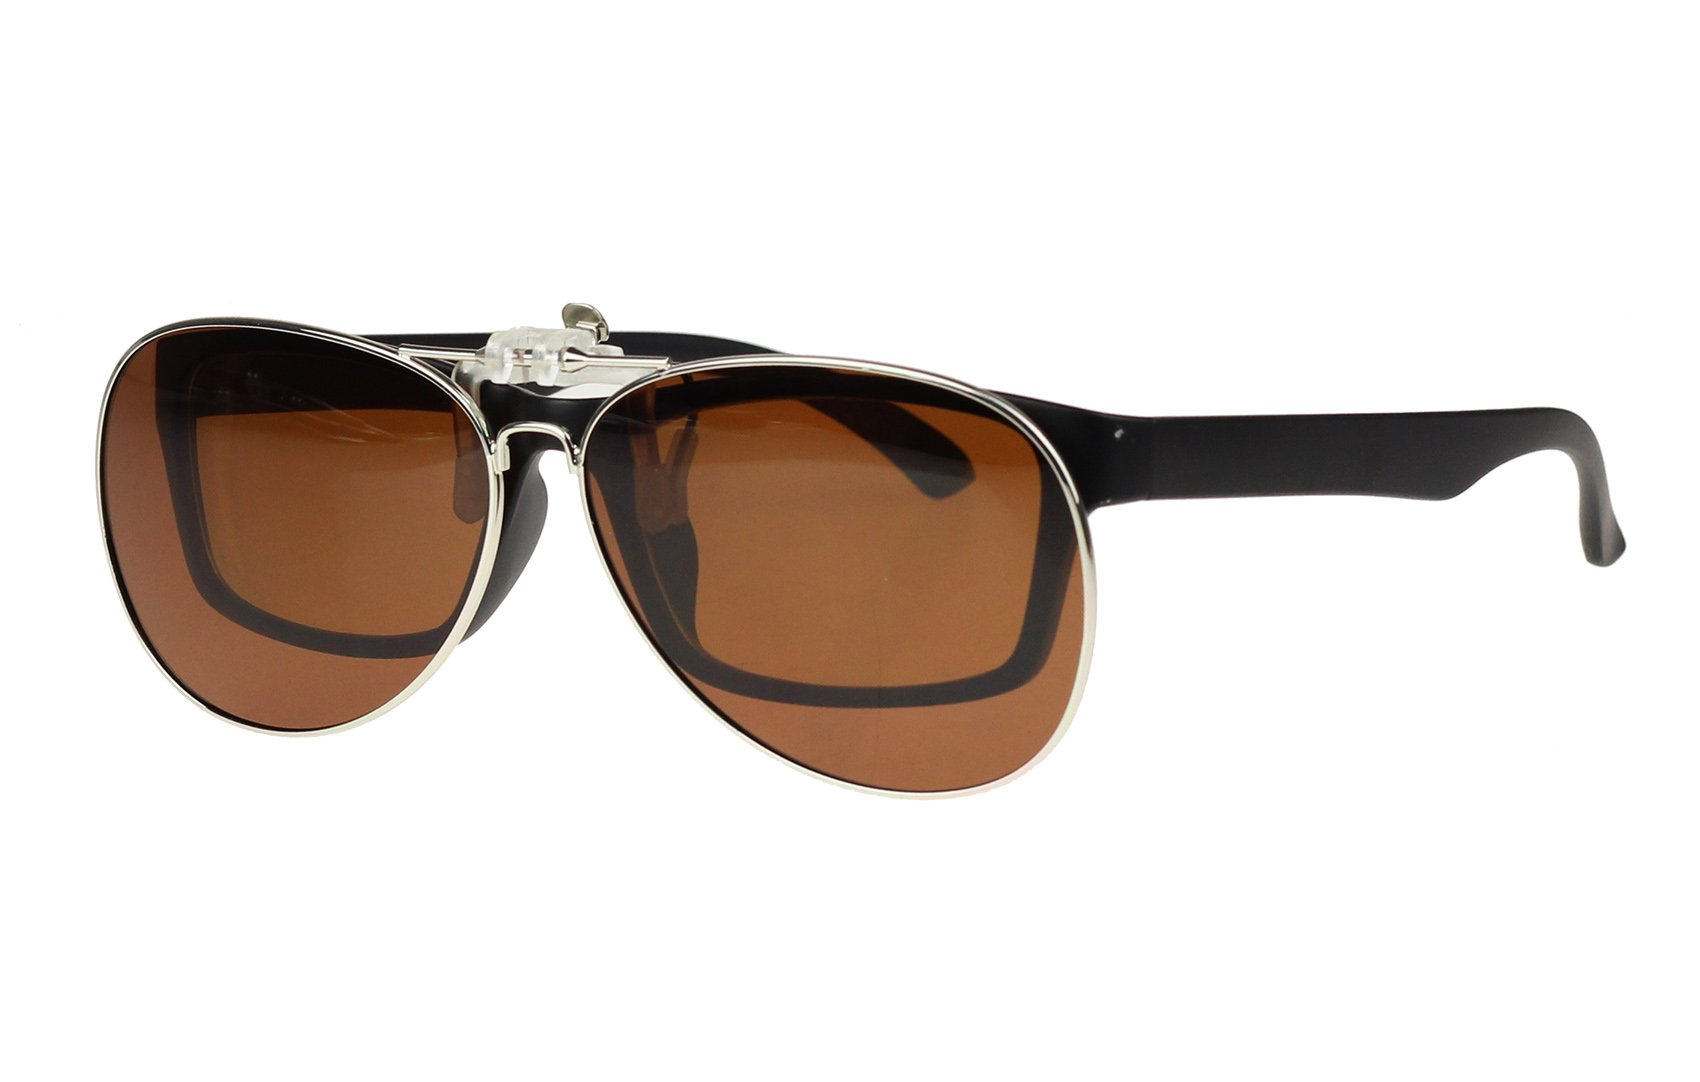 80ae13e5c48 Jaky Retro Polarized Lens Glasses Clip on Flip up High Grade Silicone Clip  Classic AVIATOR Reflective UV400 UV Protection Mens Womens Sunglasses For  Driving ...